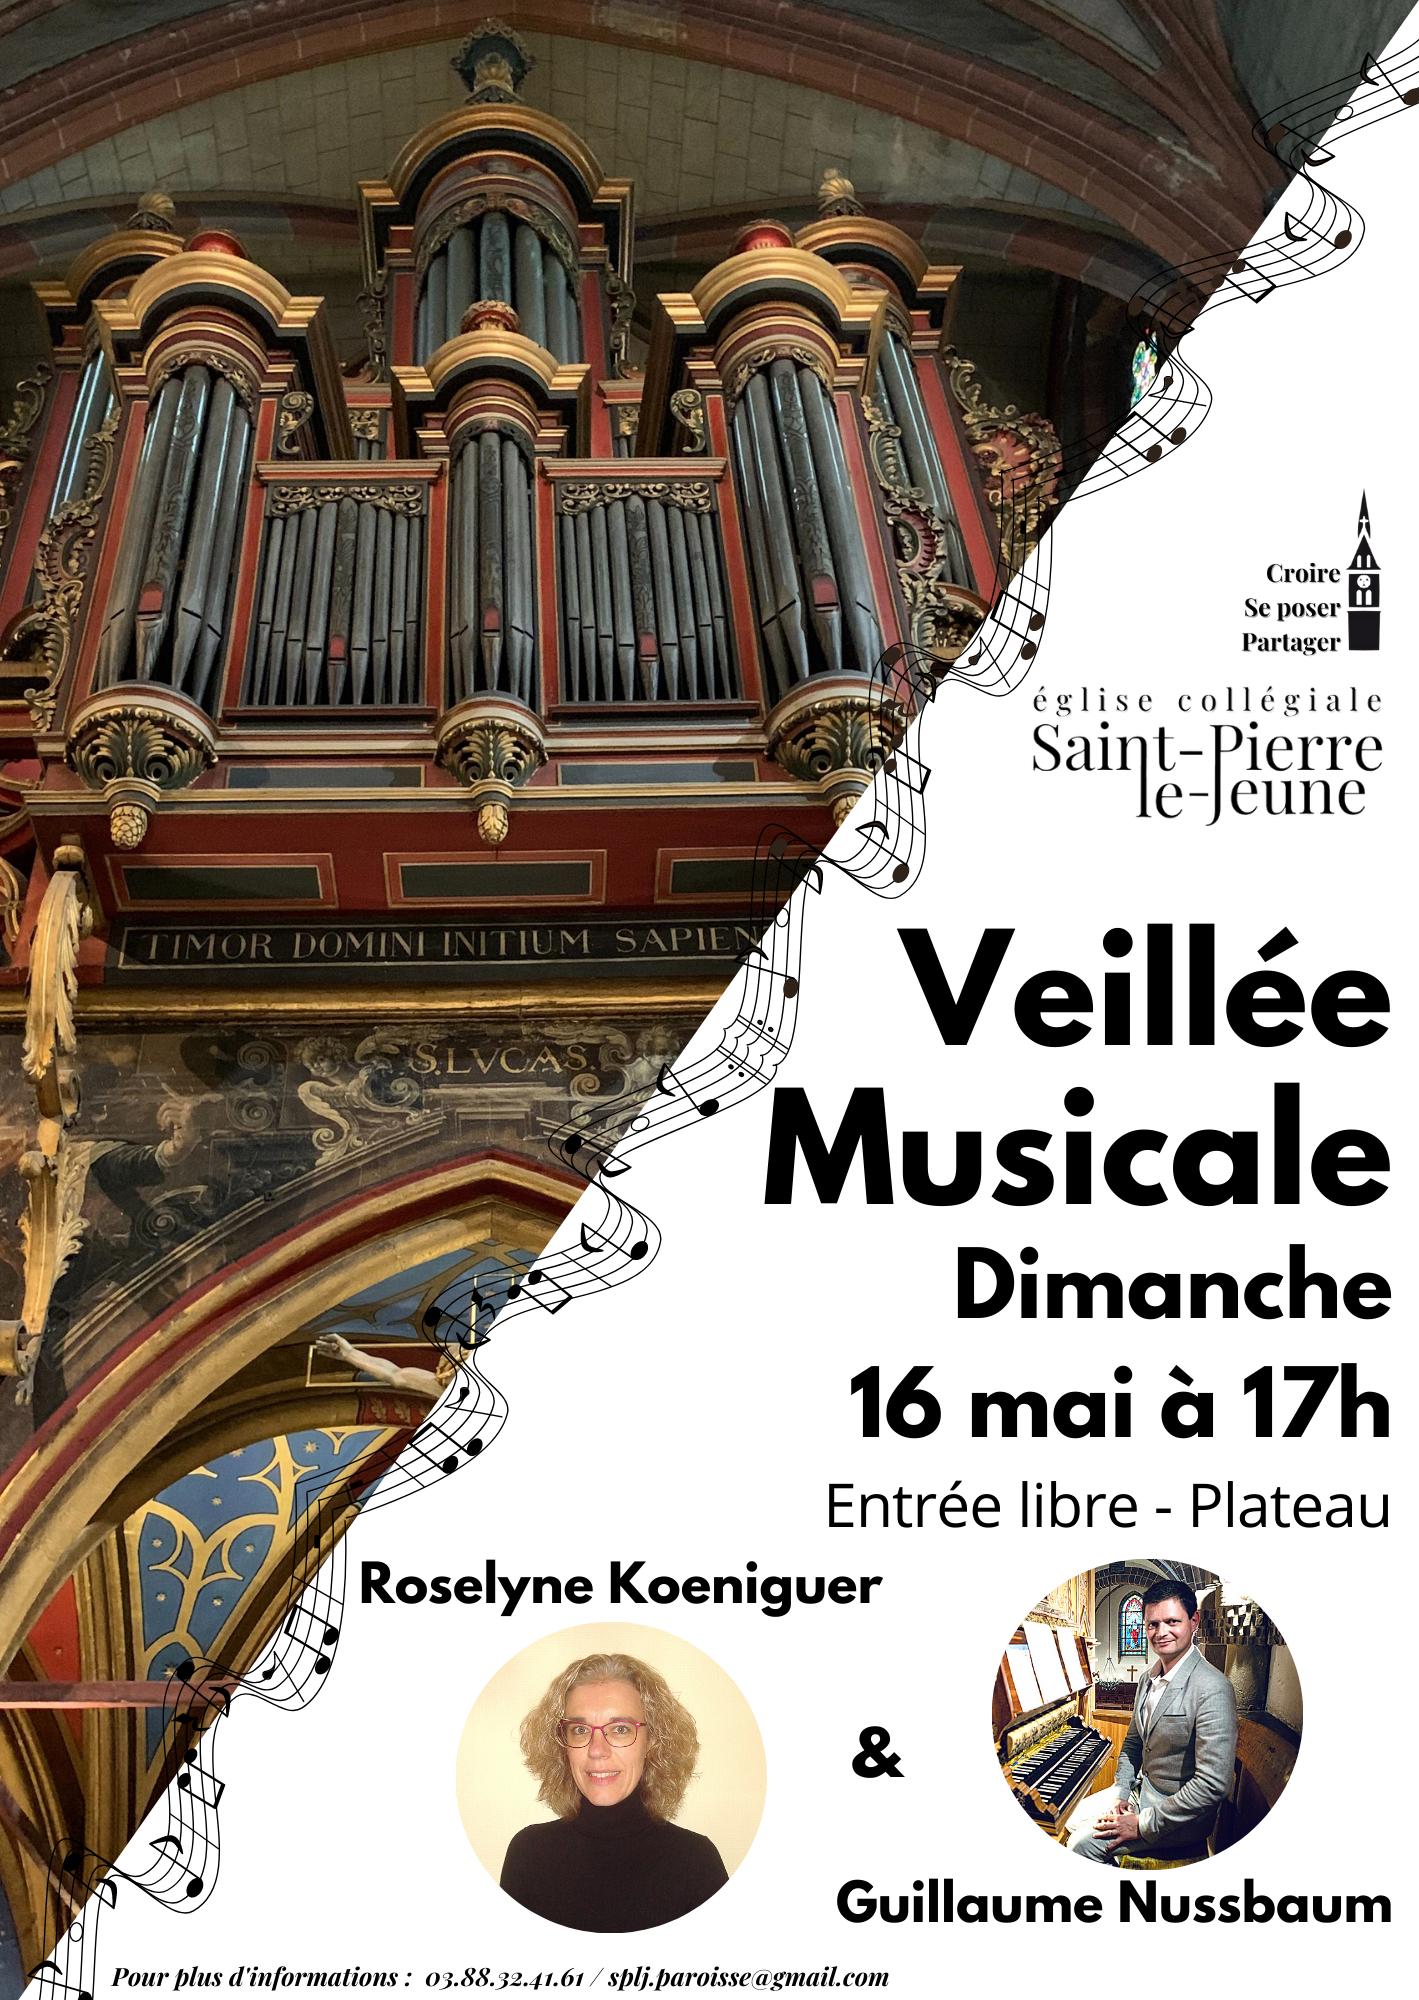 Veillée musicale - Dimanche 16 mai 2021